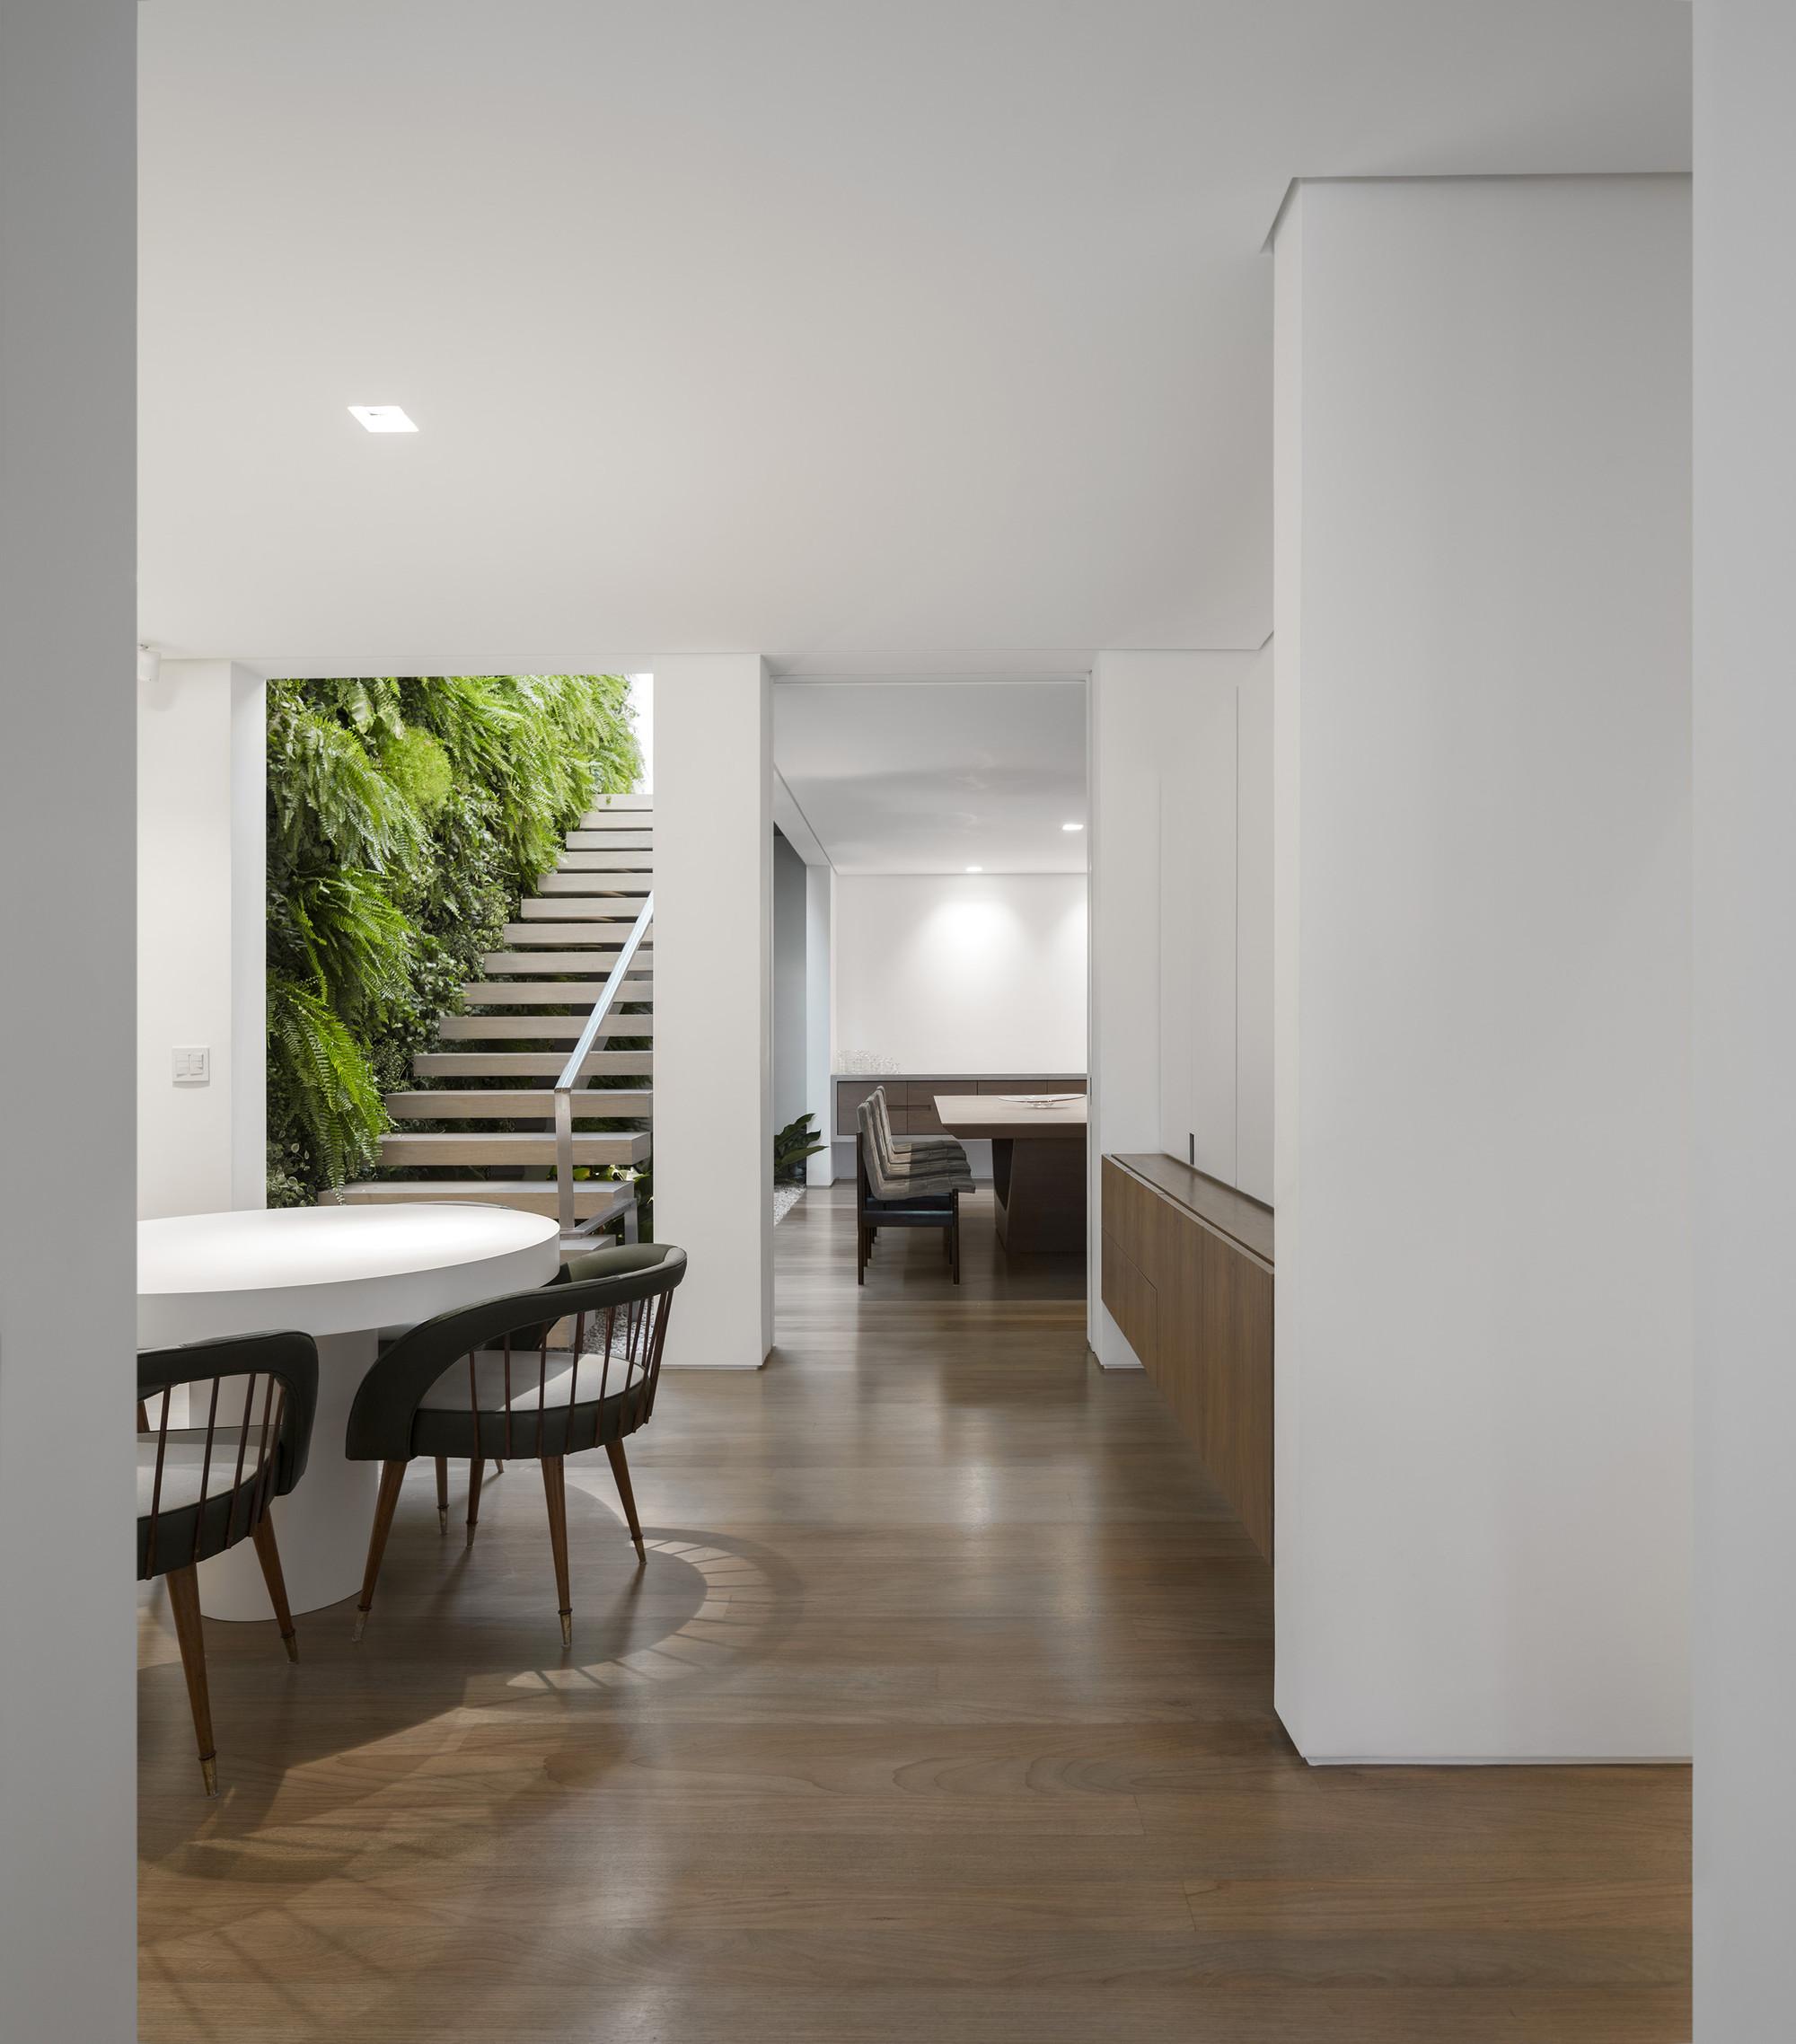 Galeria de casa k studio arthur casas 11 for Casa para herramientas de pvc